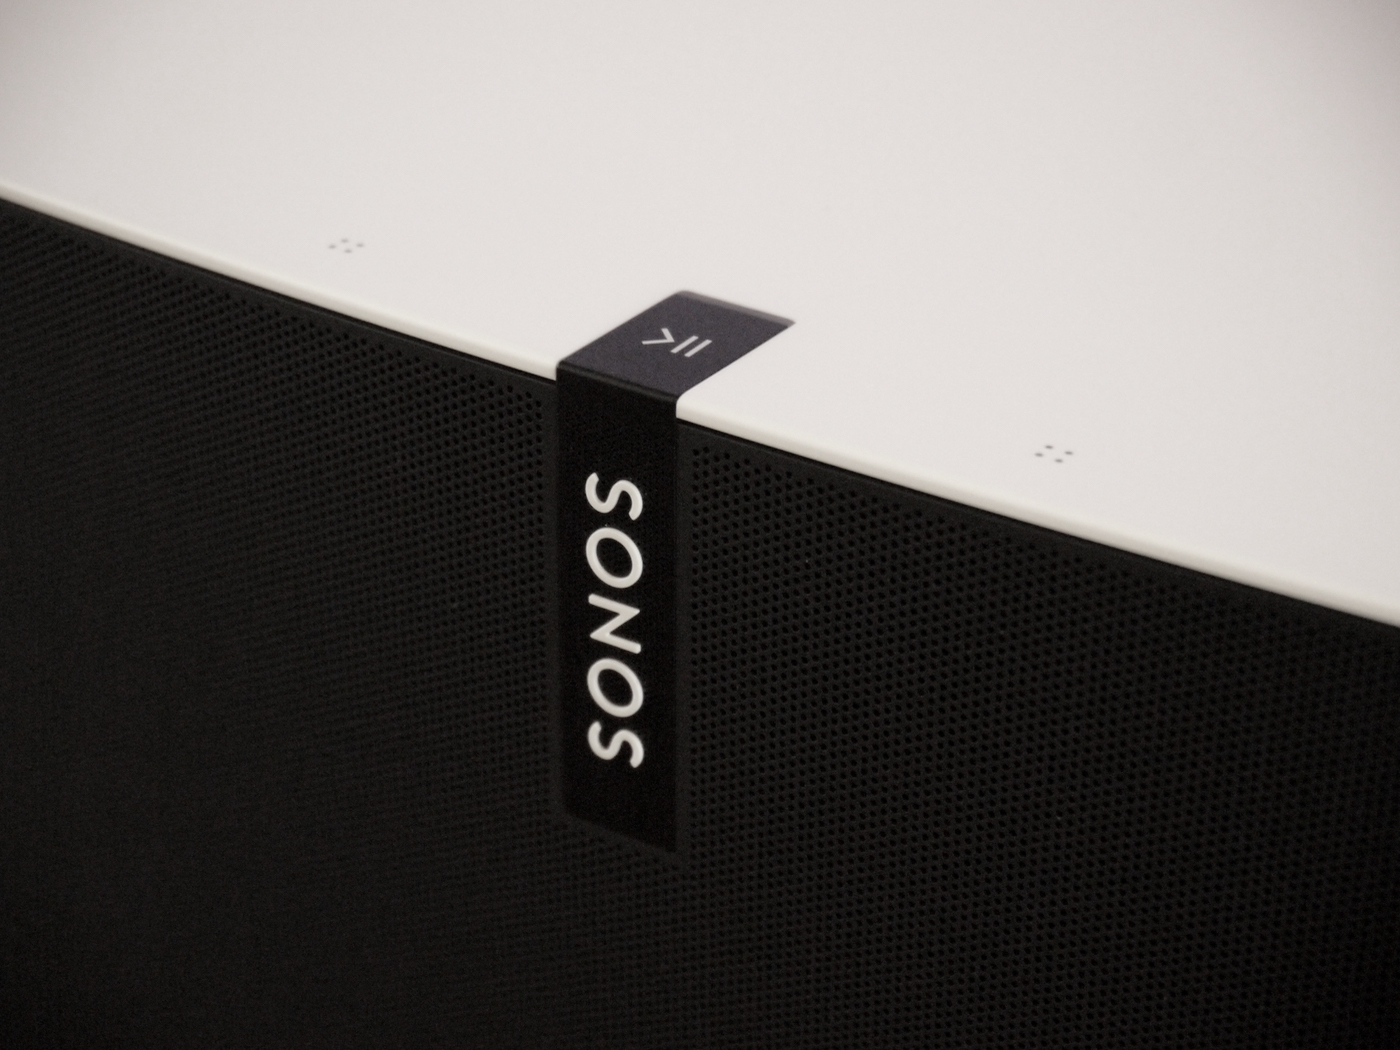 Sonos Will Support Apple Music Starting December 15th